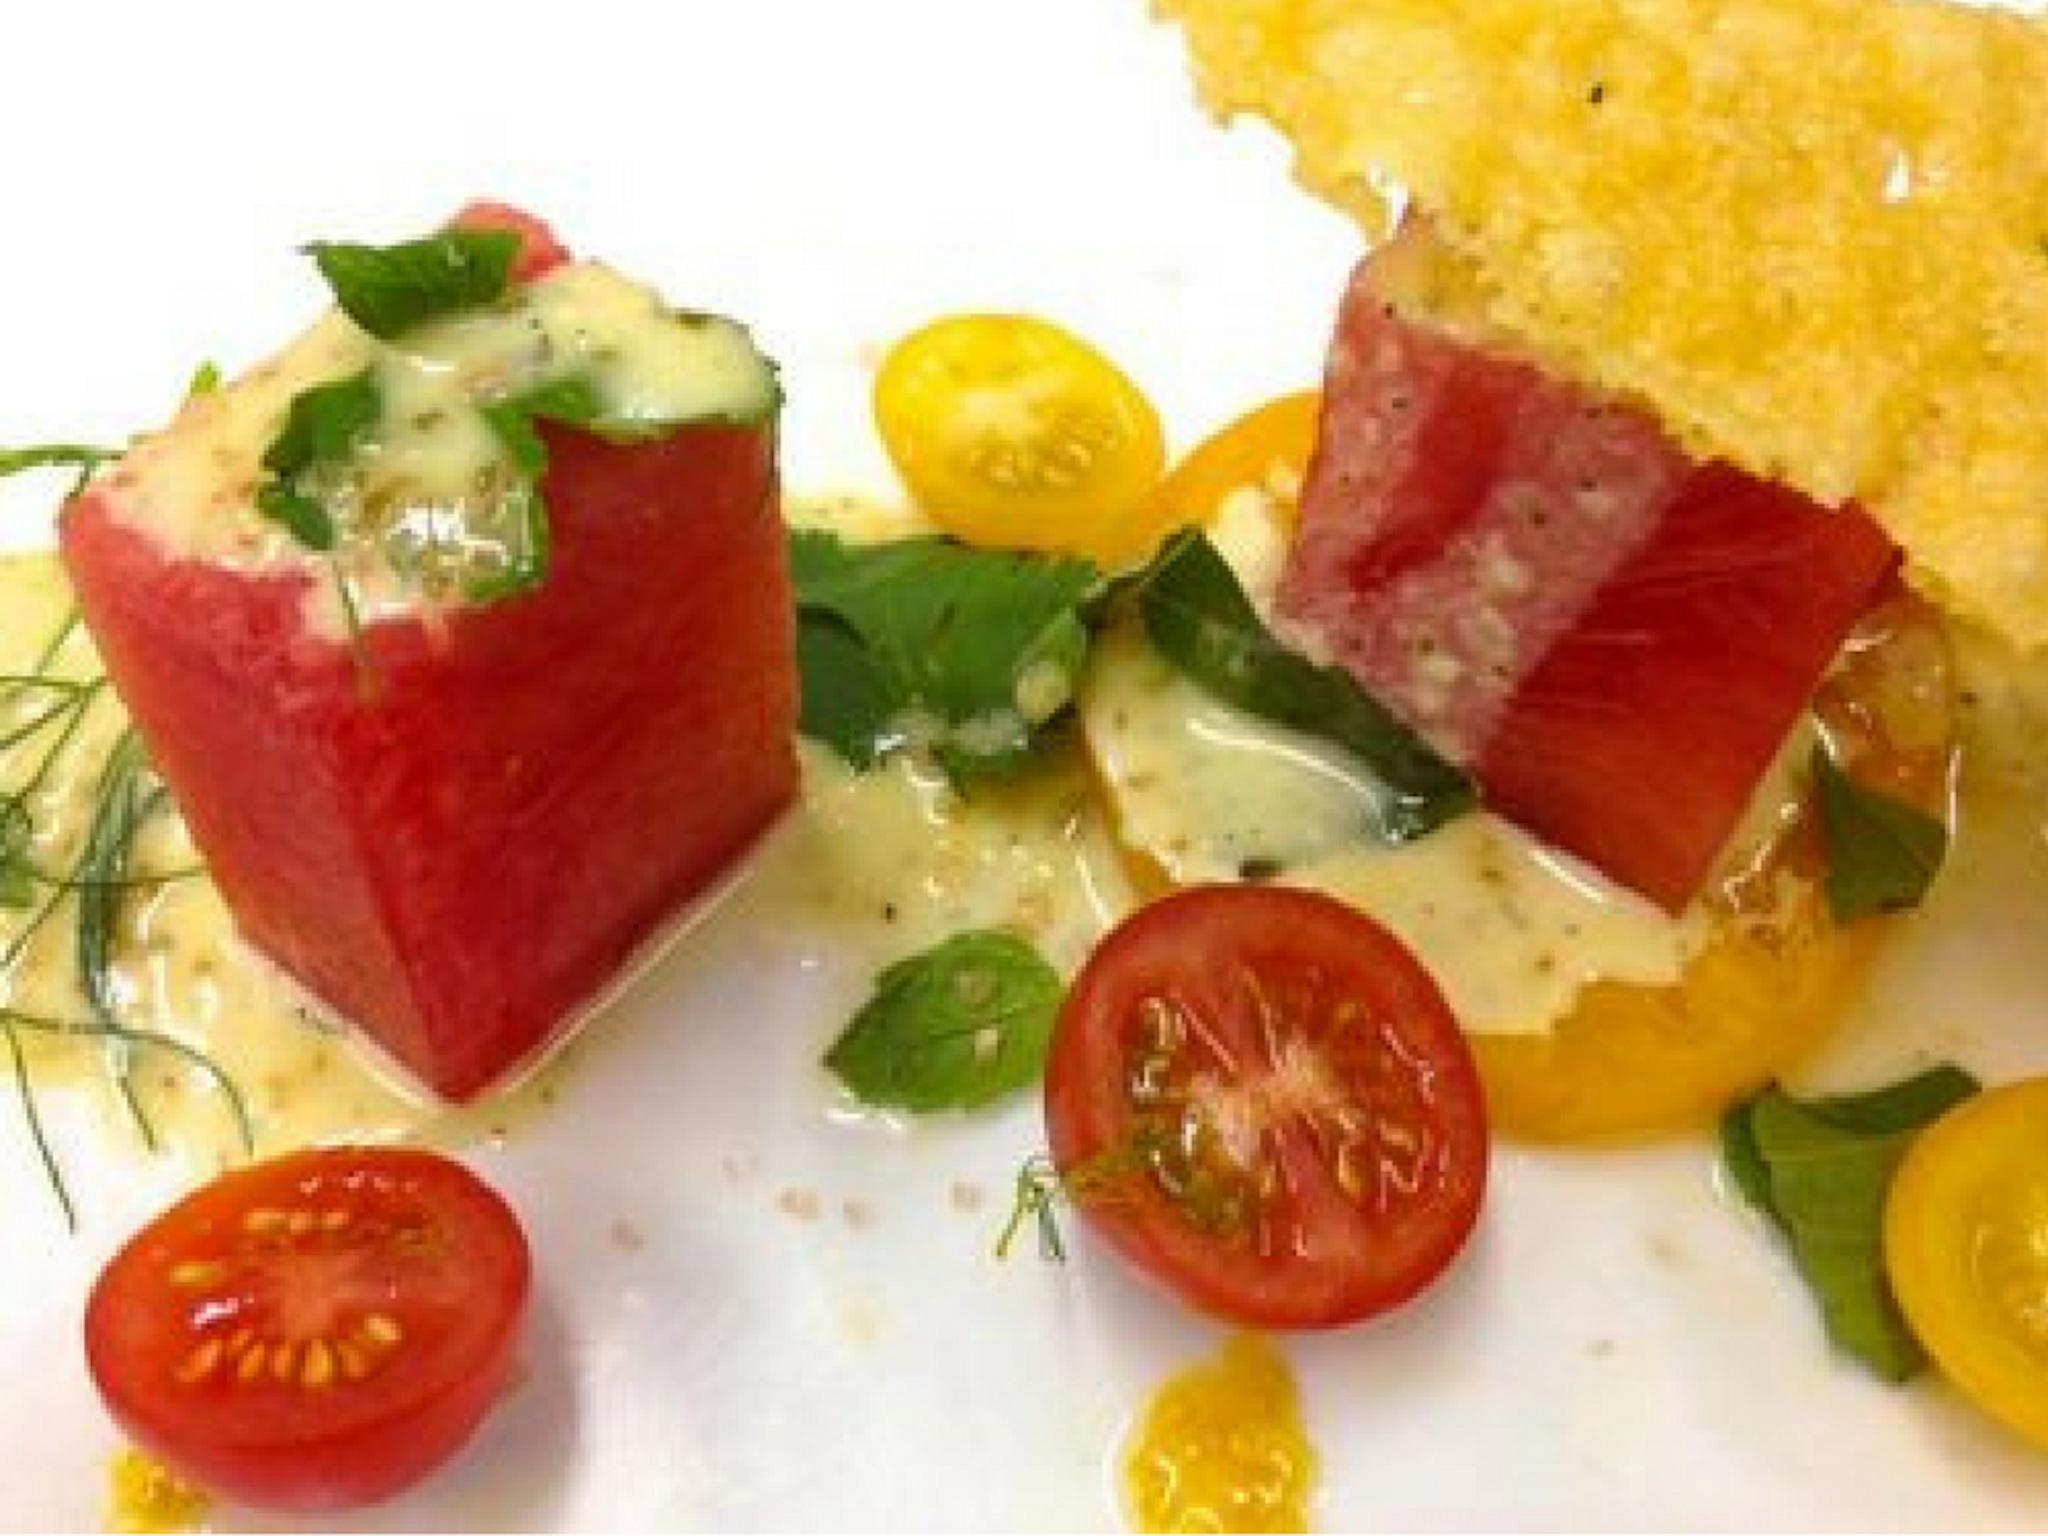 tomato and watermelon appetizer